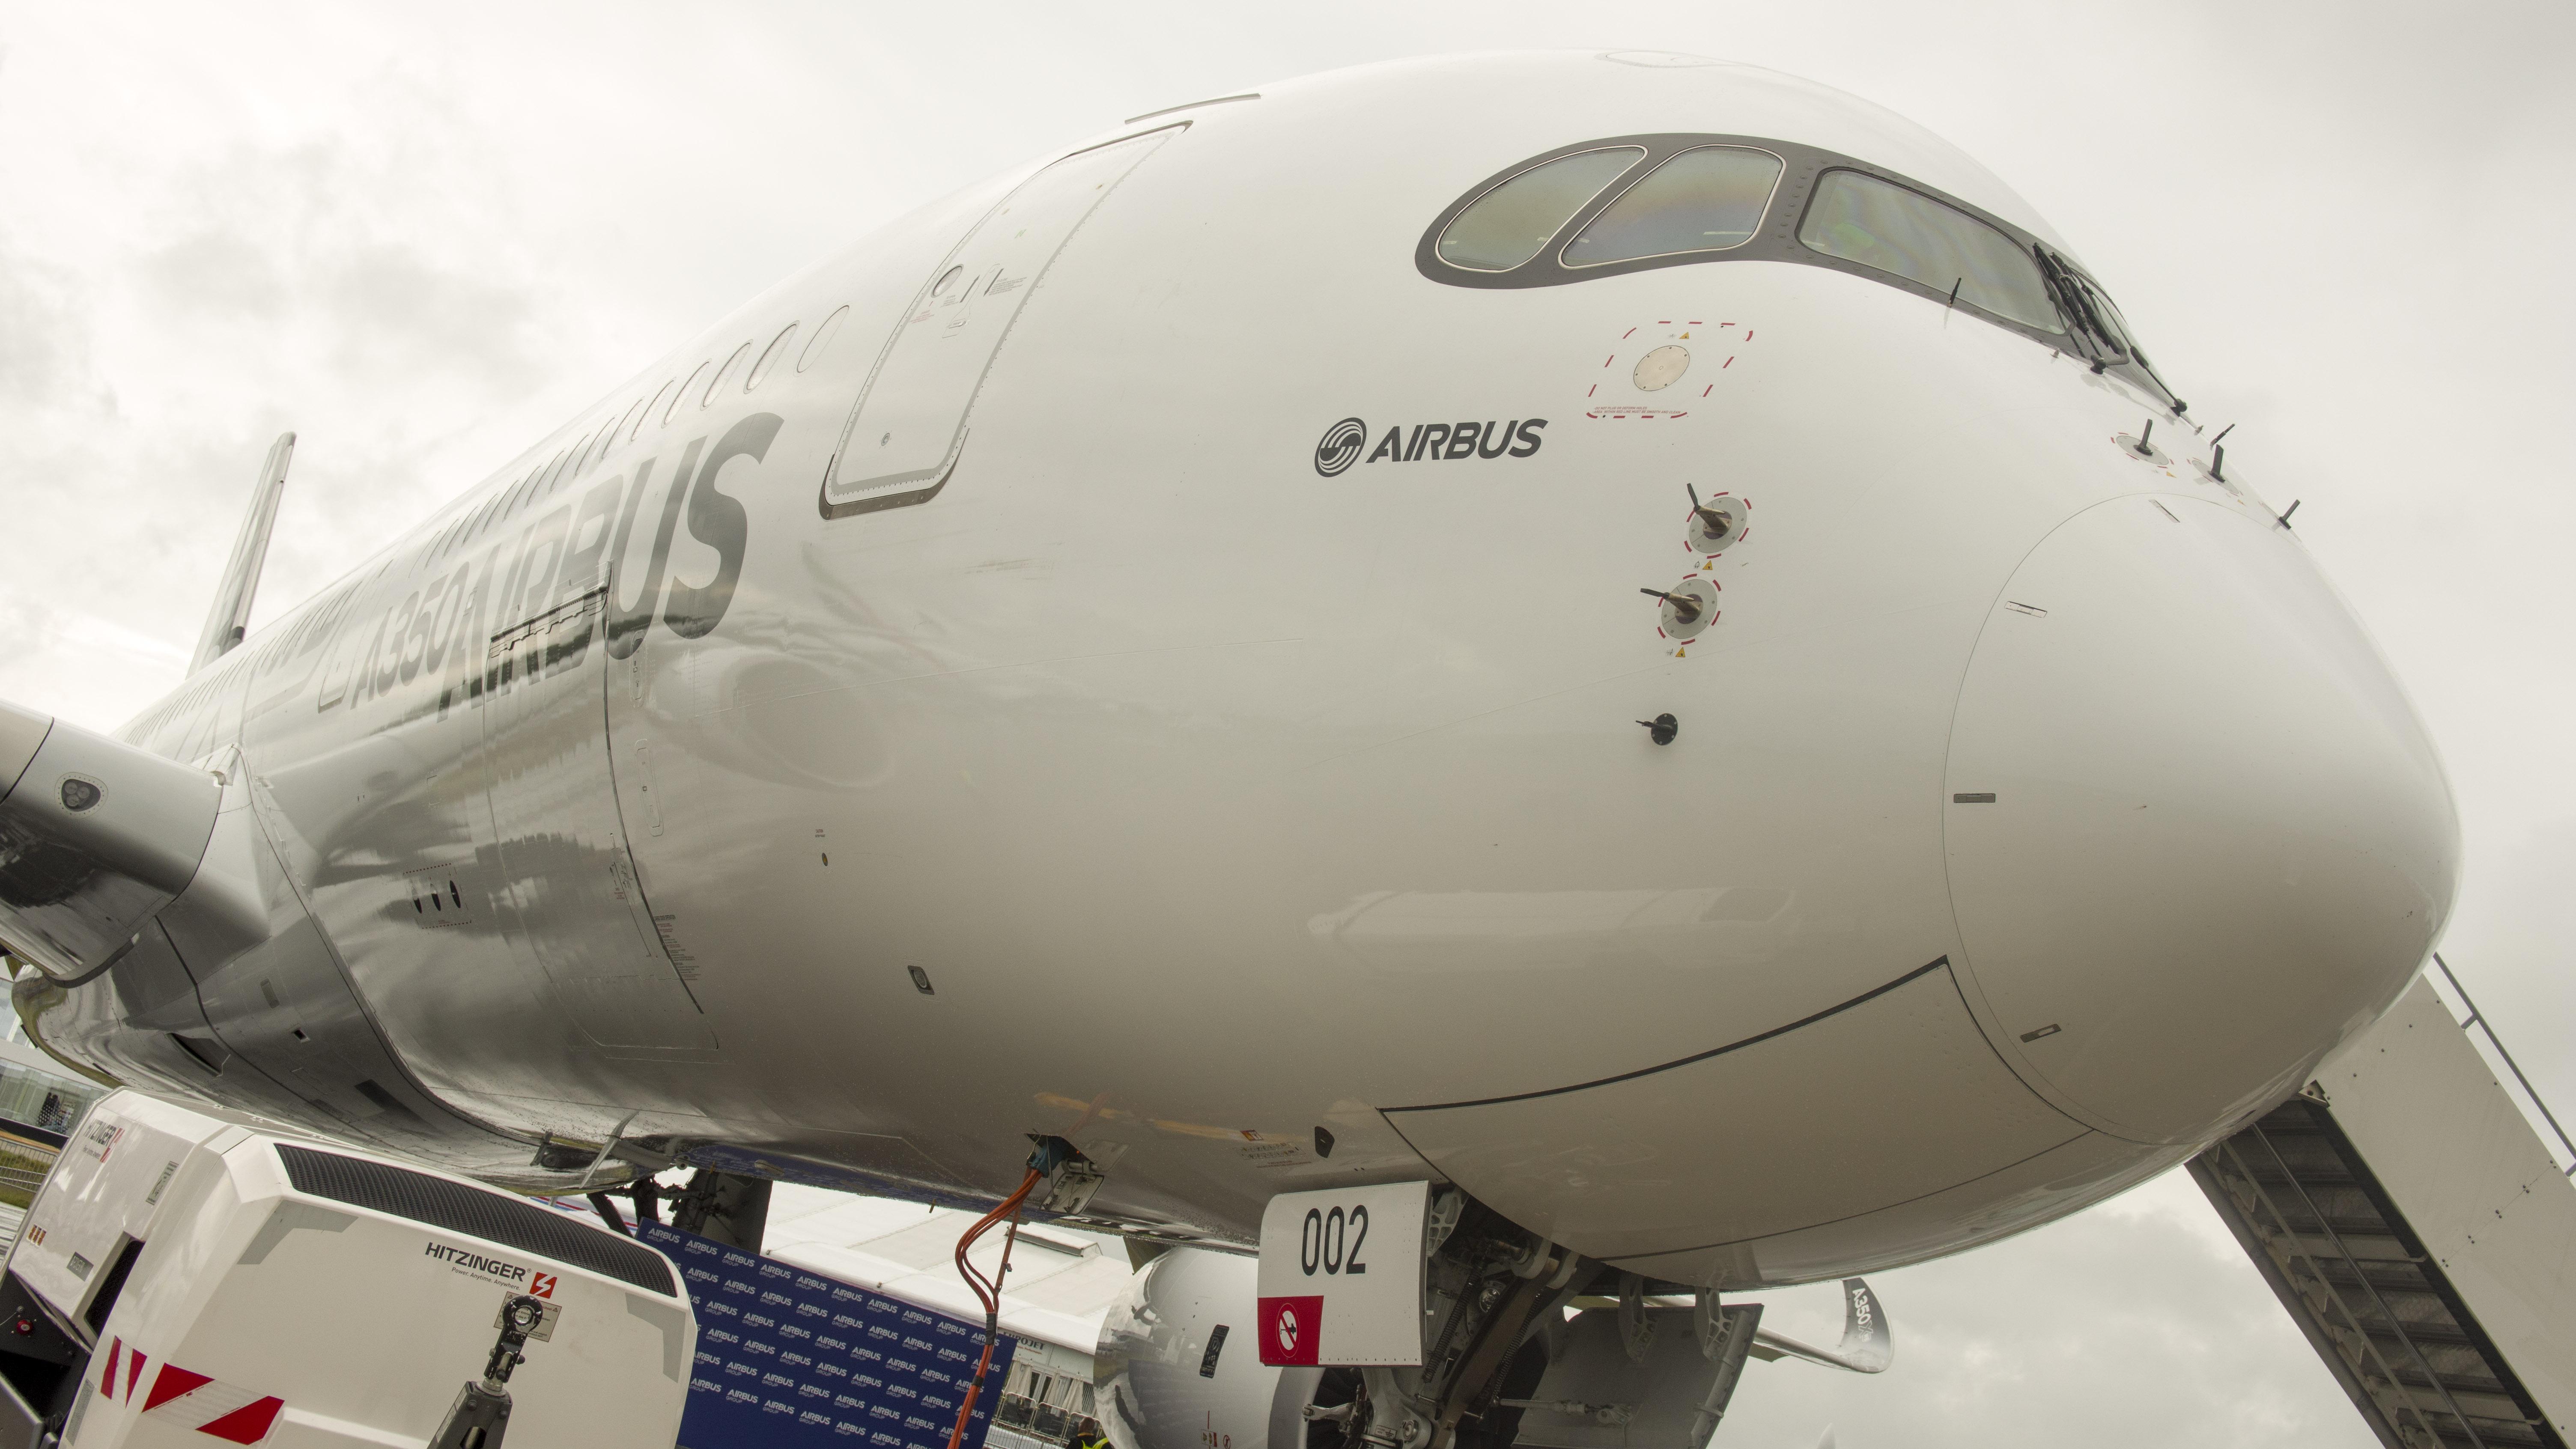 _IMG1734 Airbus A350-941 Airbus company F-WWCF